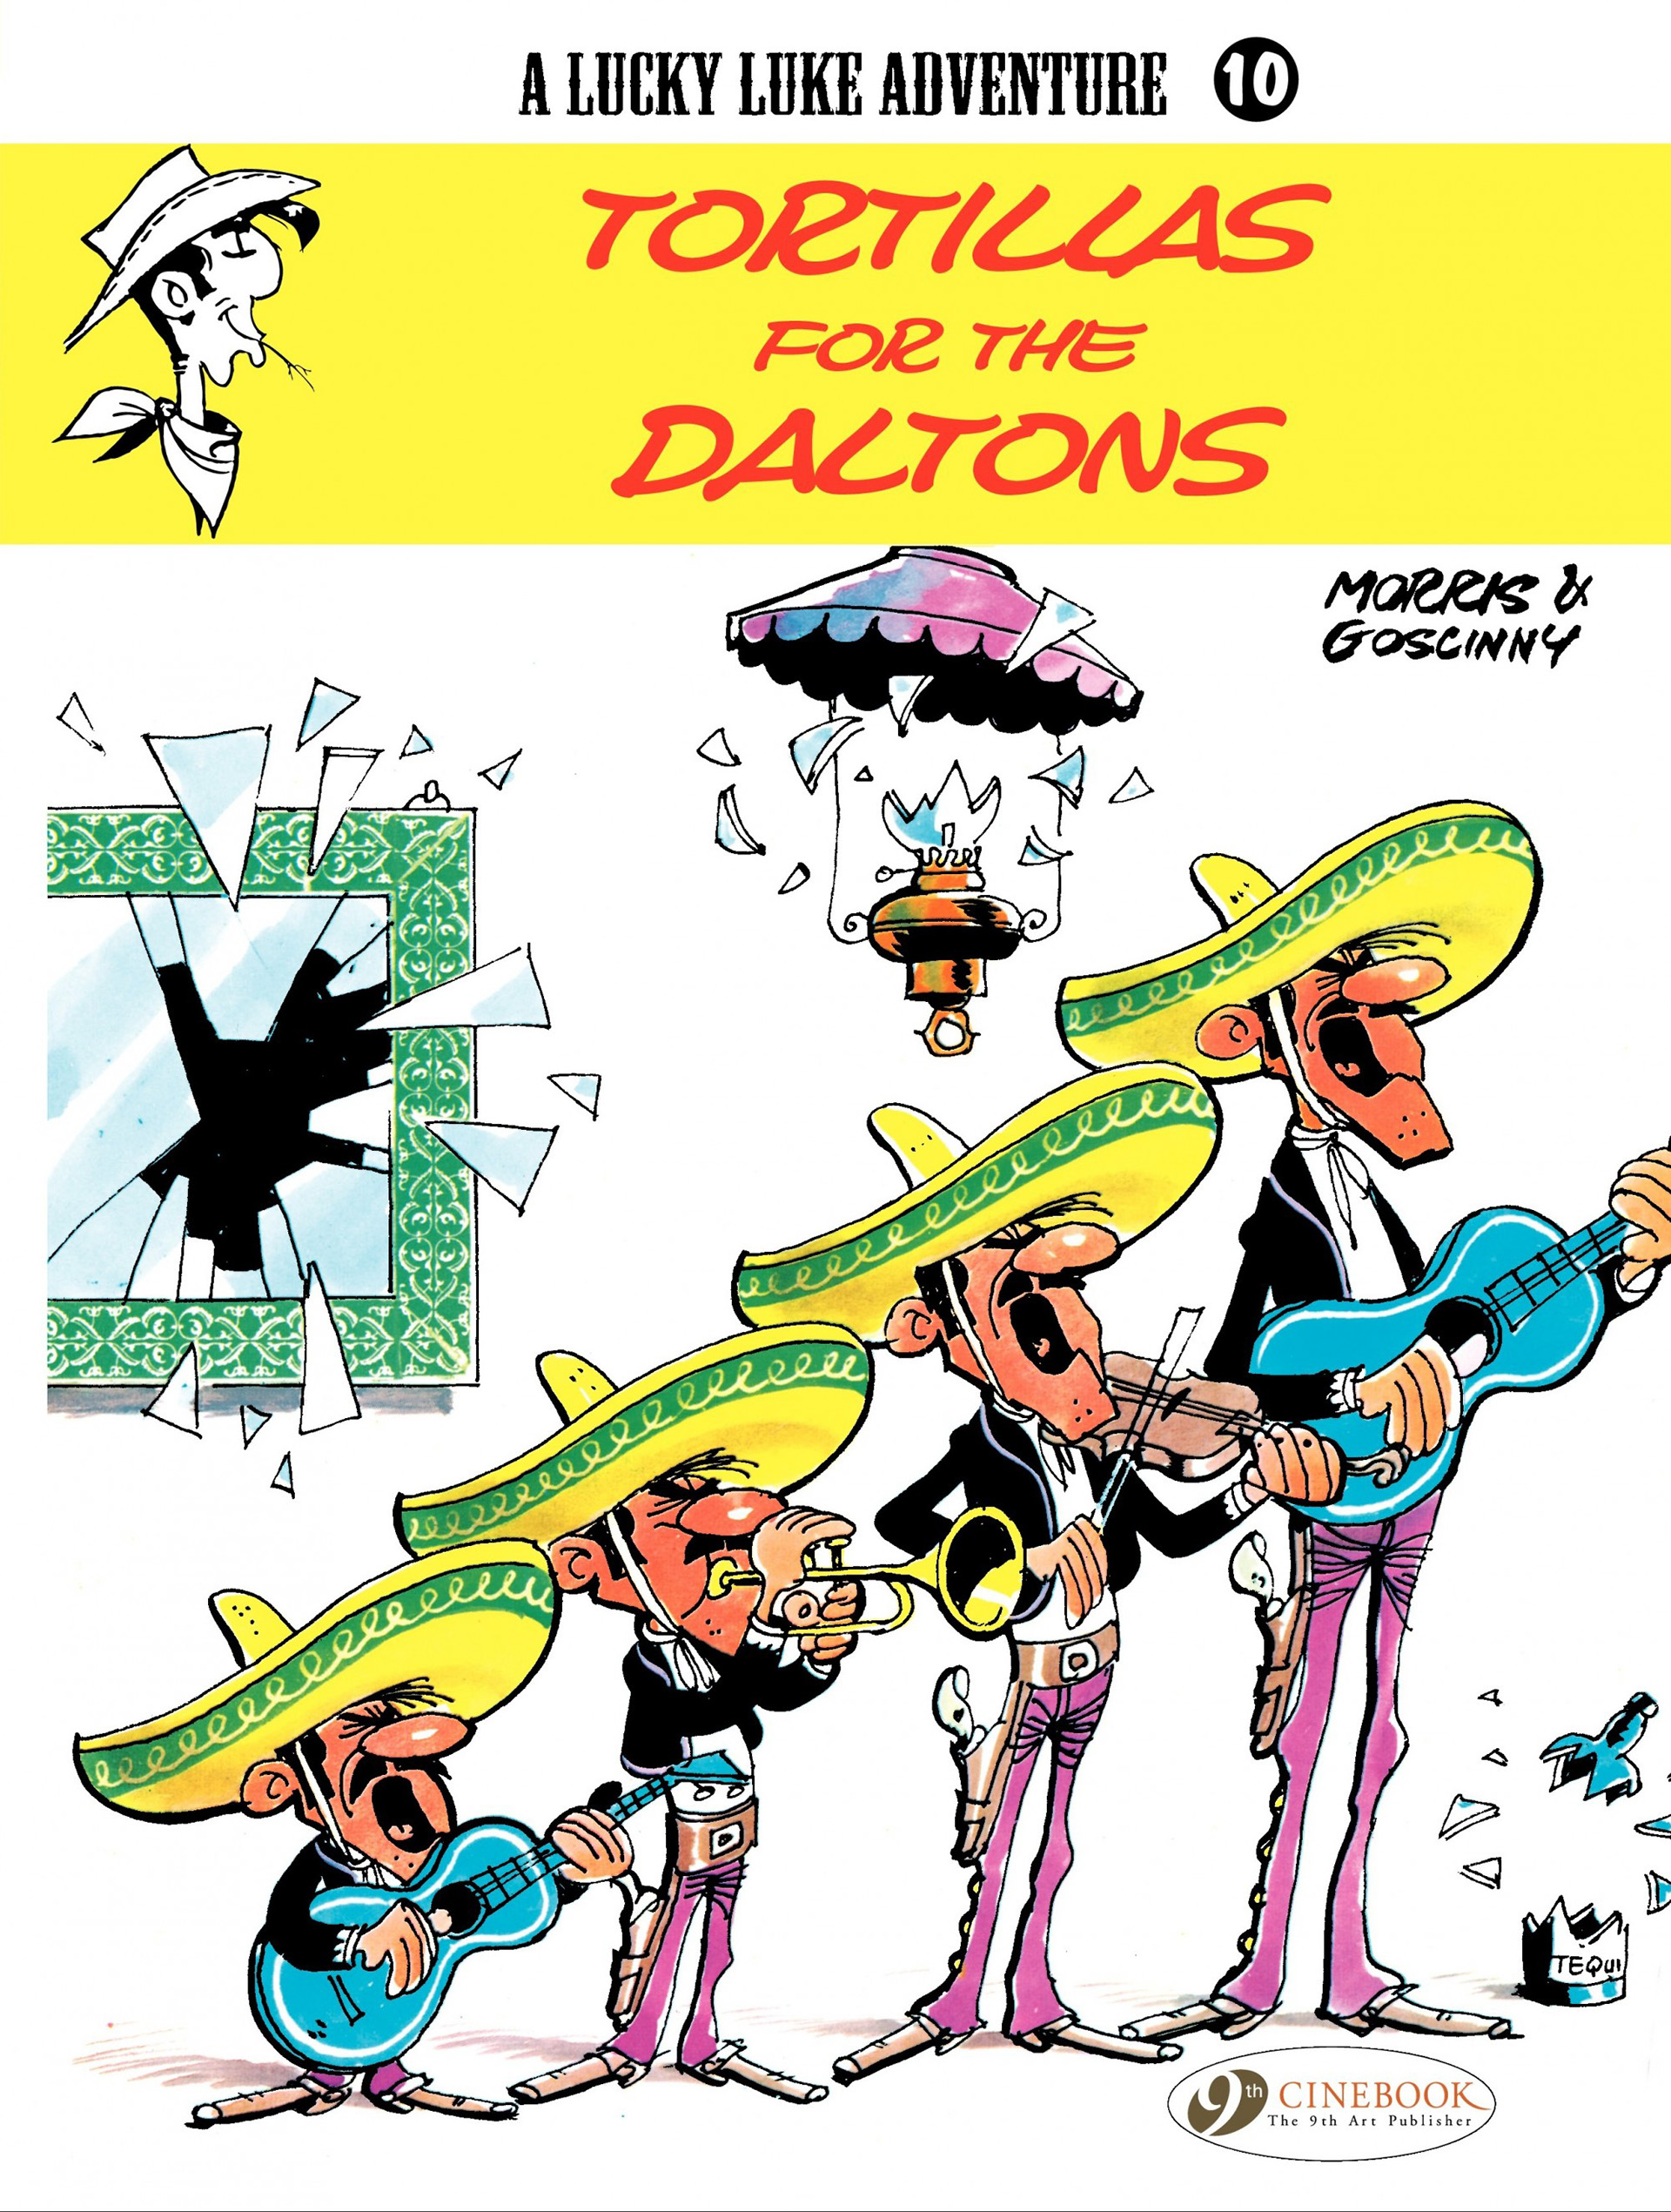 Read online A Lucky Luke Adventure comic -  Issue #10 - 1